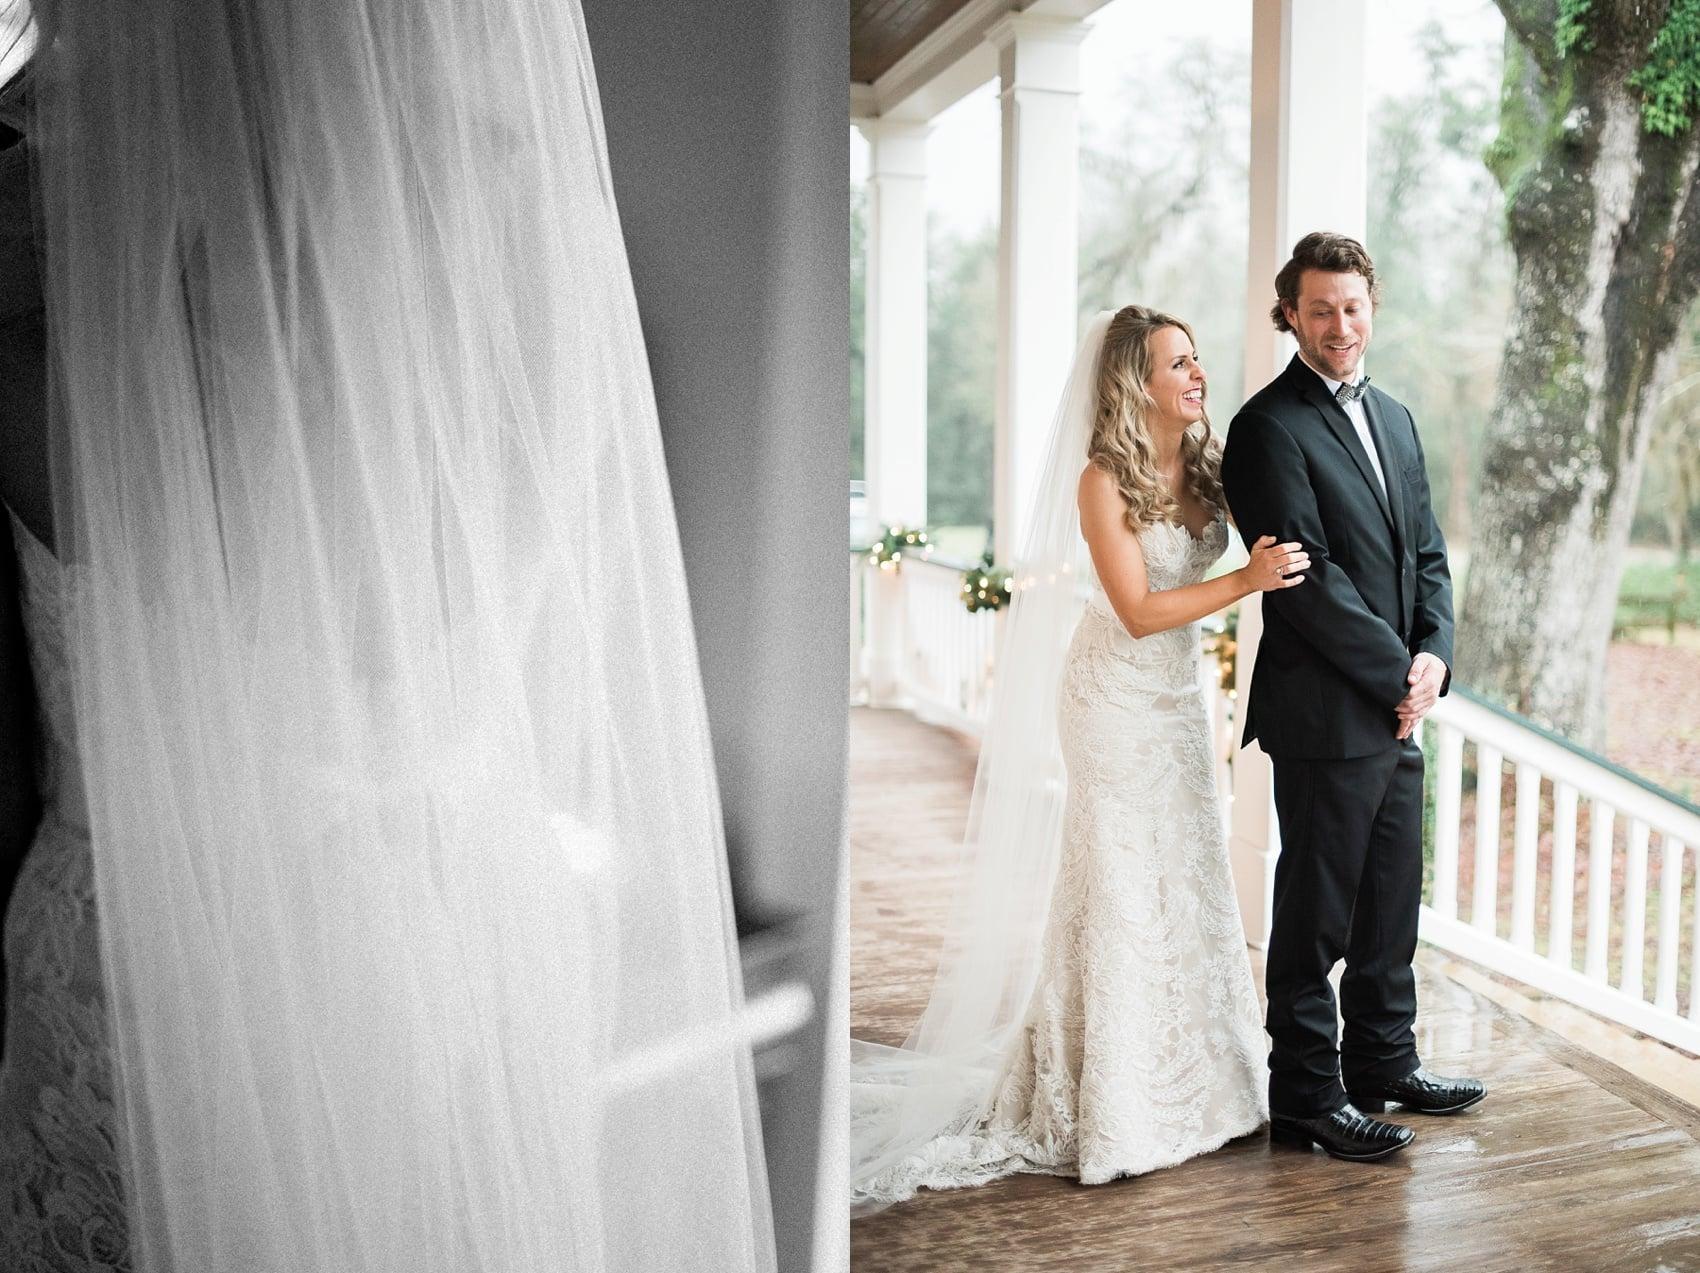 South_carolina_wedding_photographer_0155.jpg